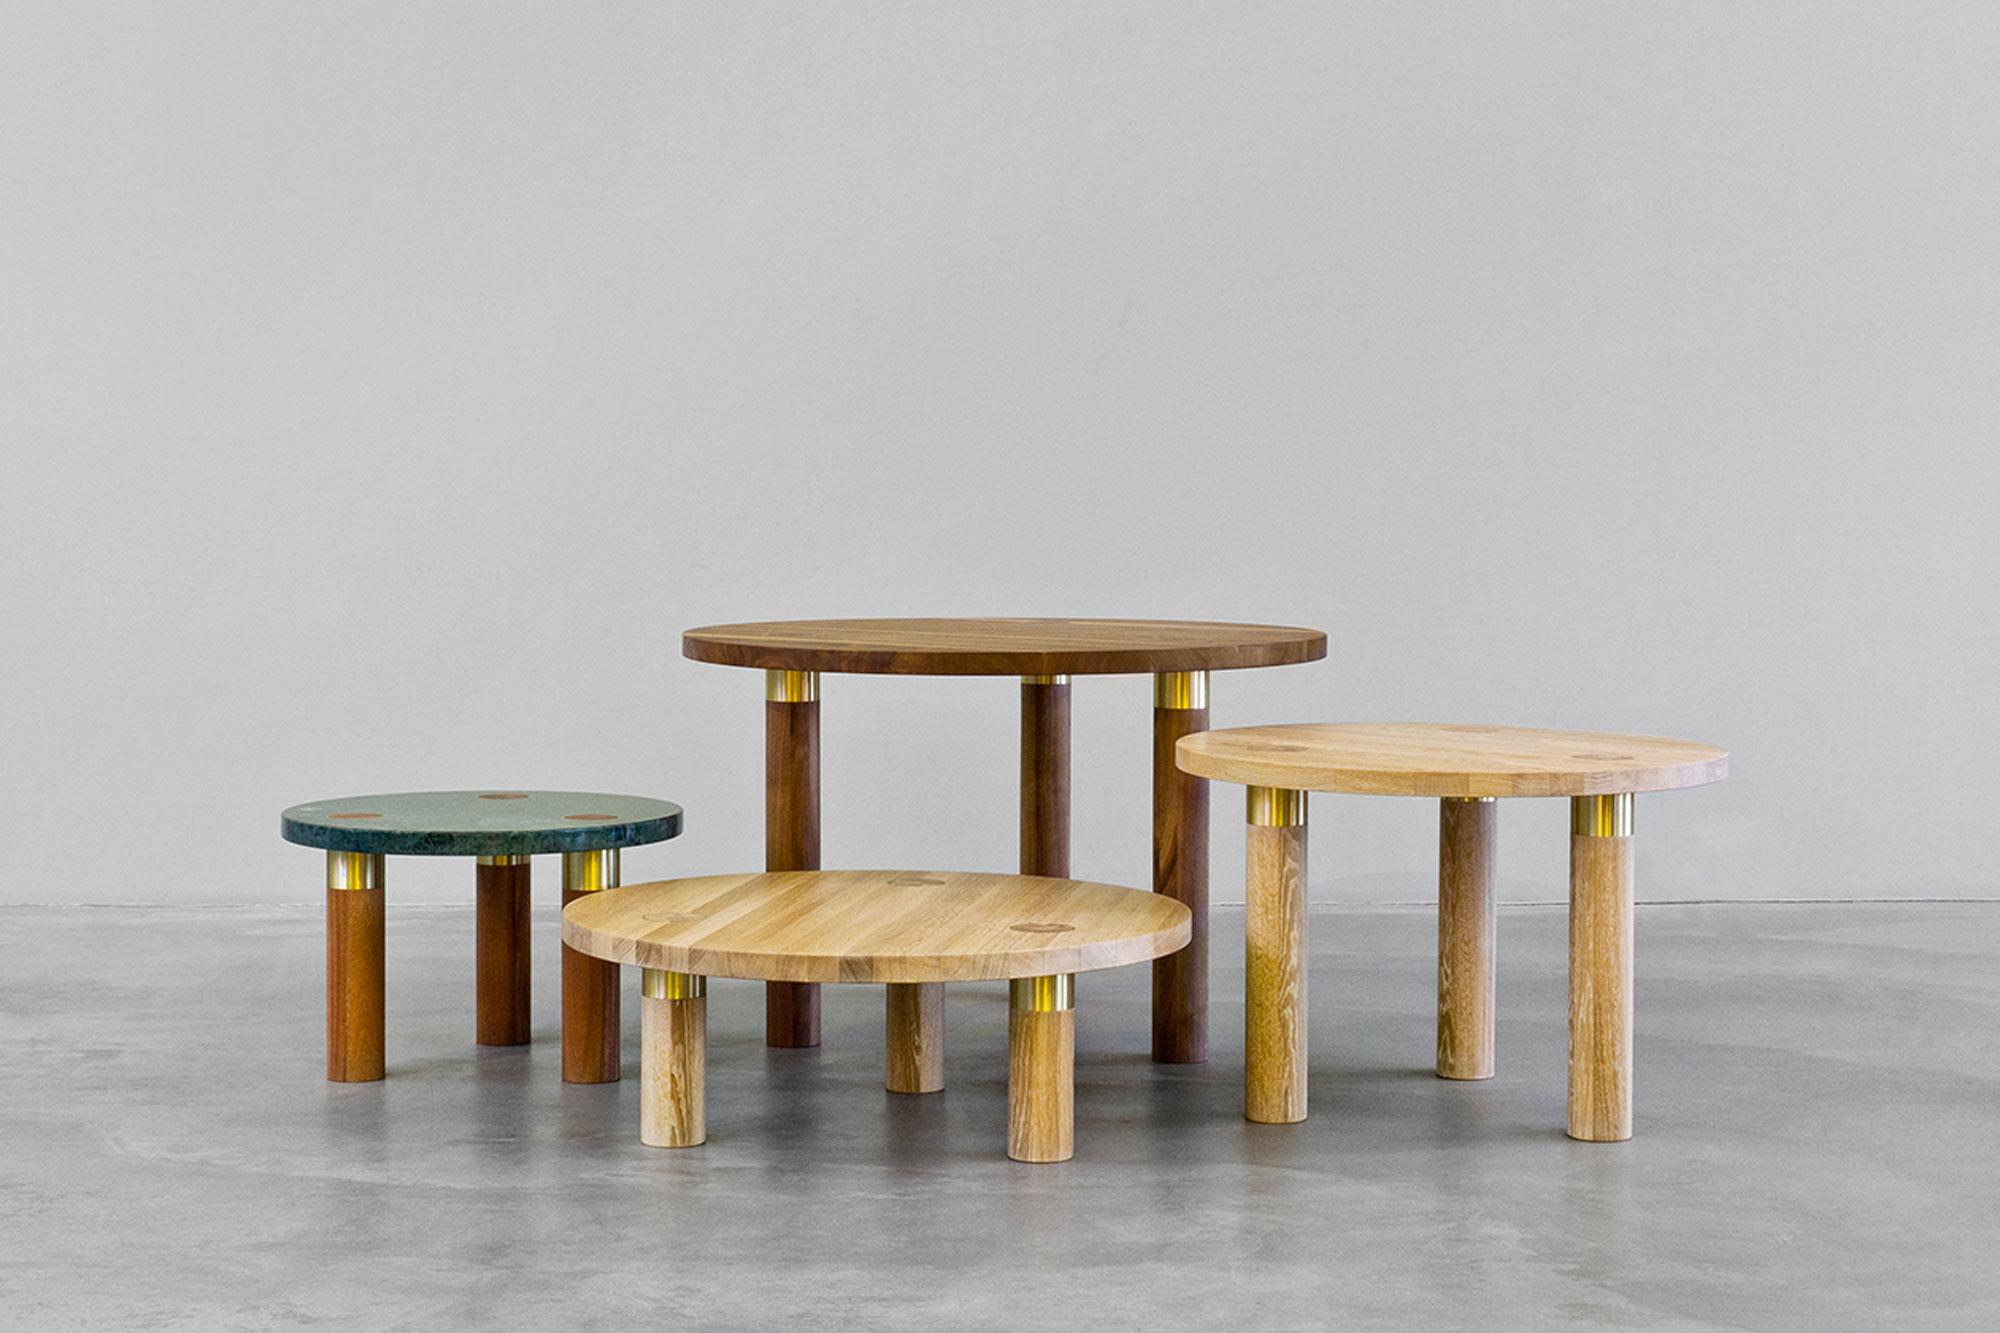 morgen-kollektion-pole-table-2